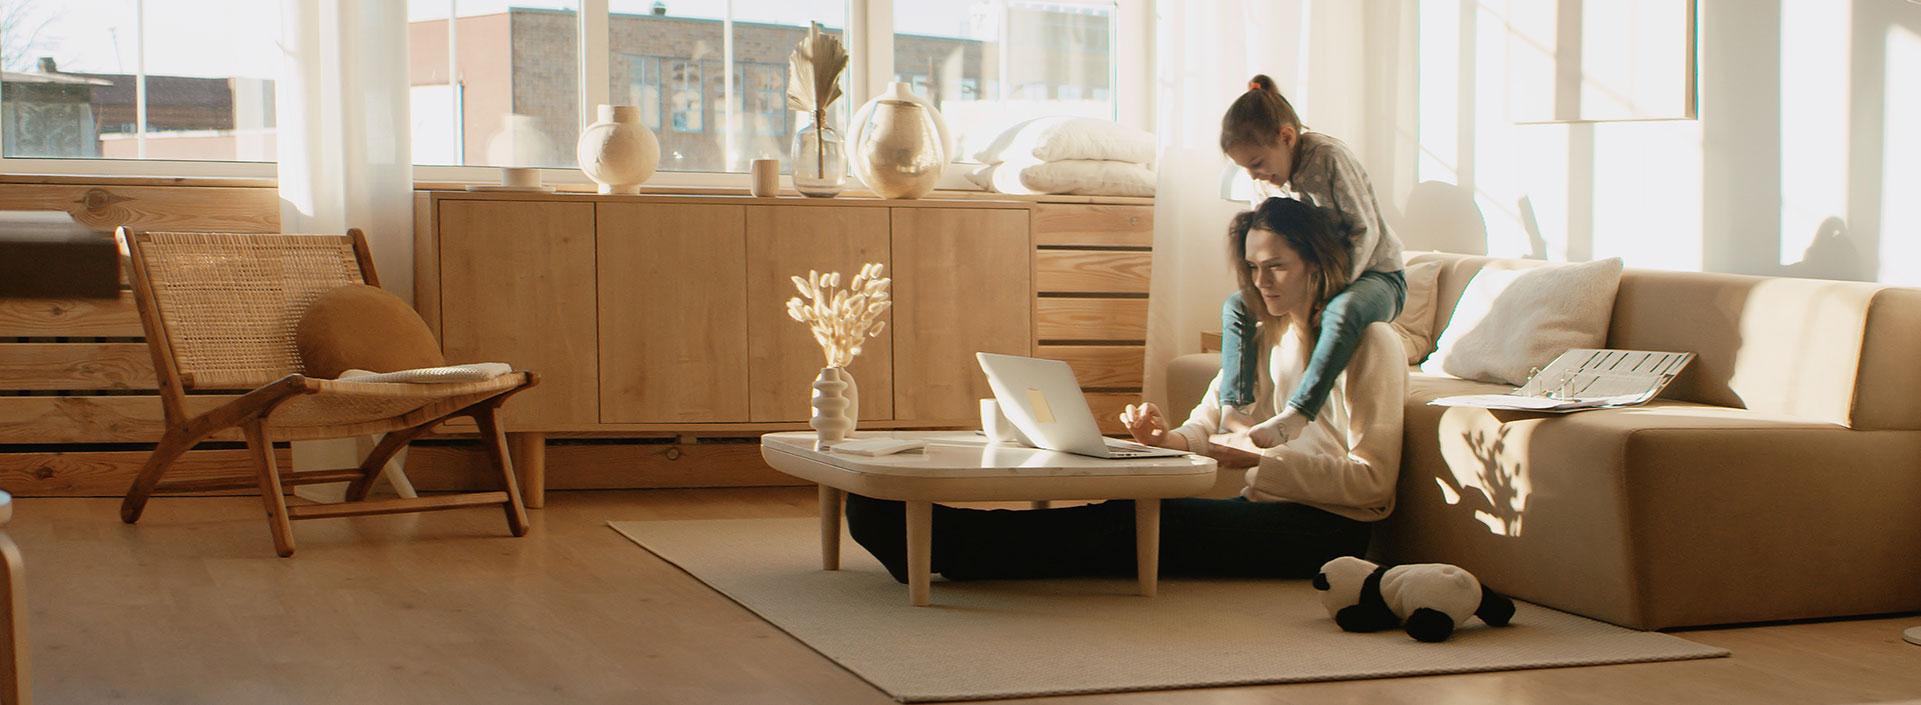 Working Toward Work-Life Balance